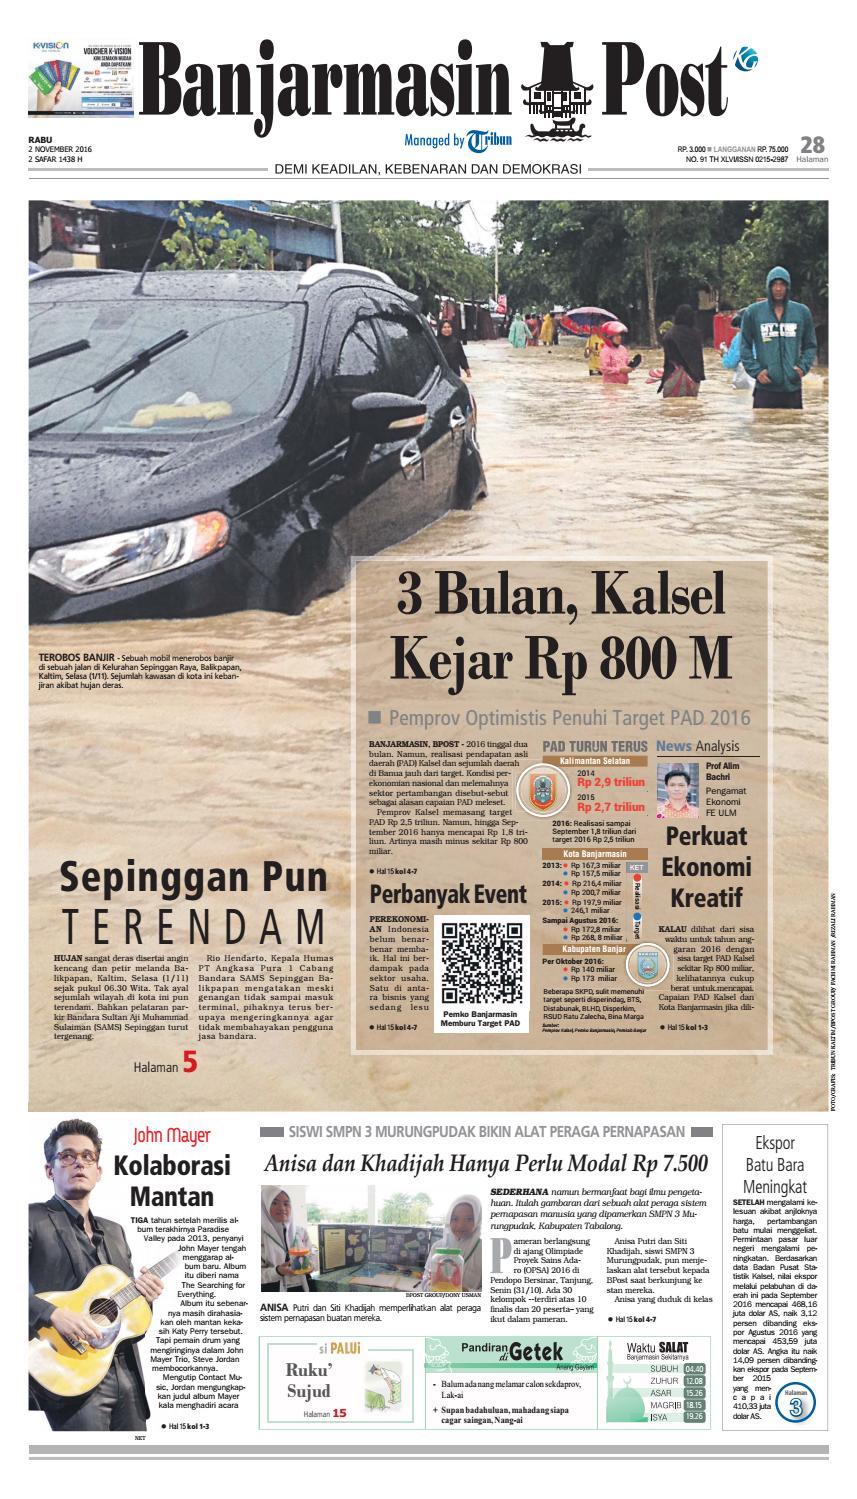 Bp20161102 By Banjarmasin Post Issuu Produk Ukm Bumn Tas Phiton Kembang Orchid